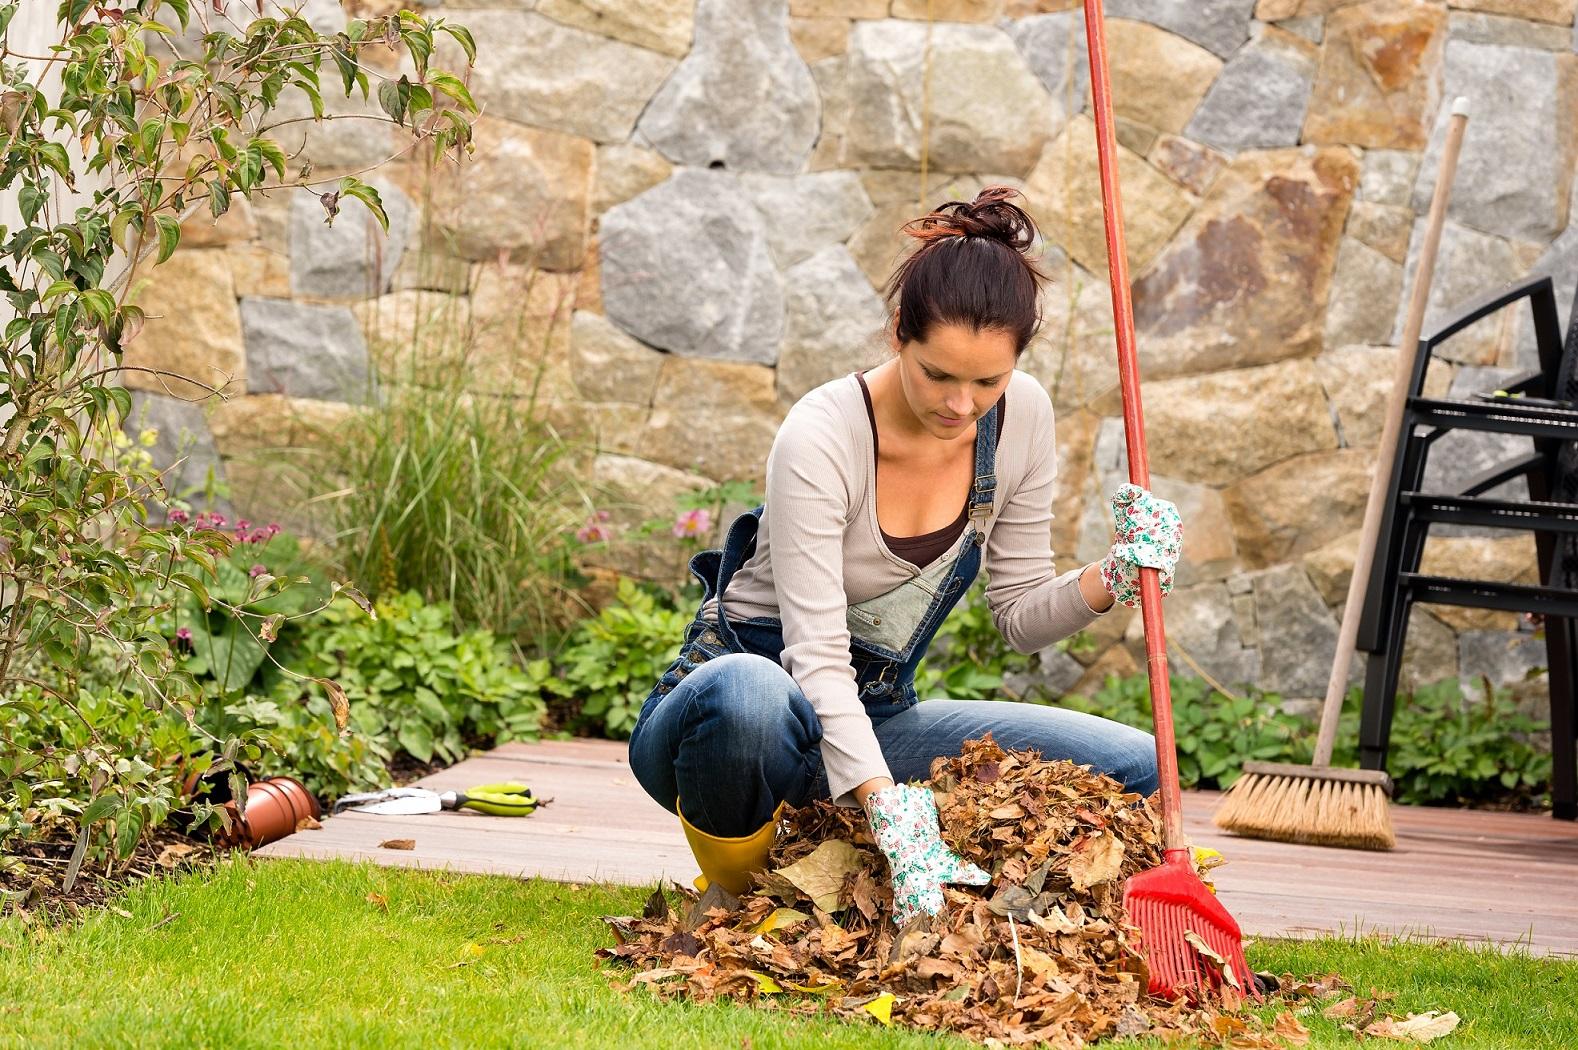 nettoyage feuilles automne, jardinage, entretien jardin,jardinier, Nid'Dom Anglet, Niddom, Bayonne , Biarritz